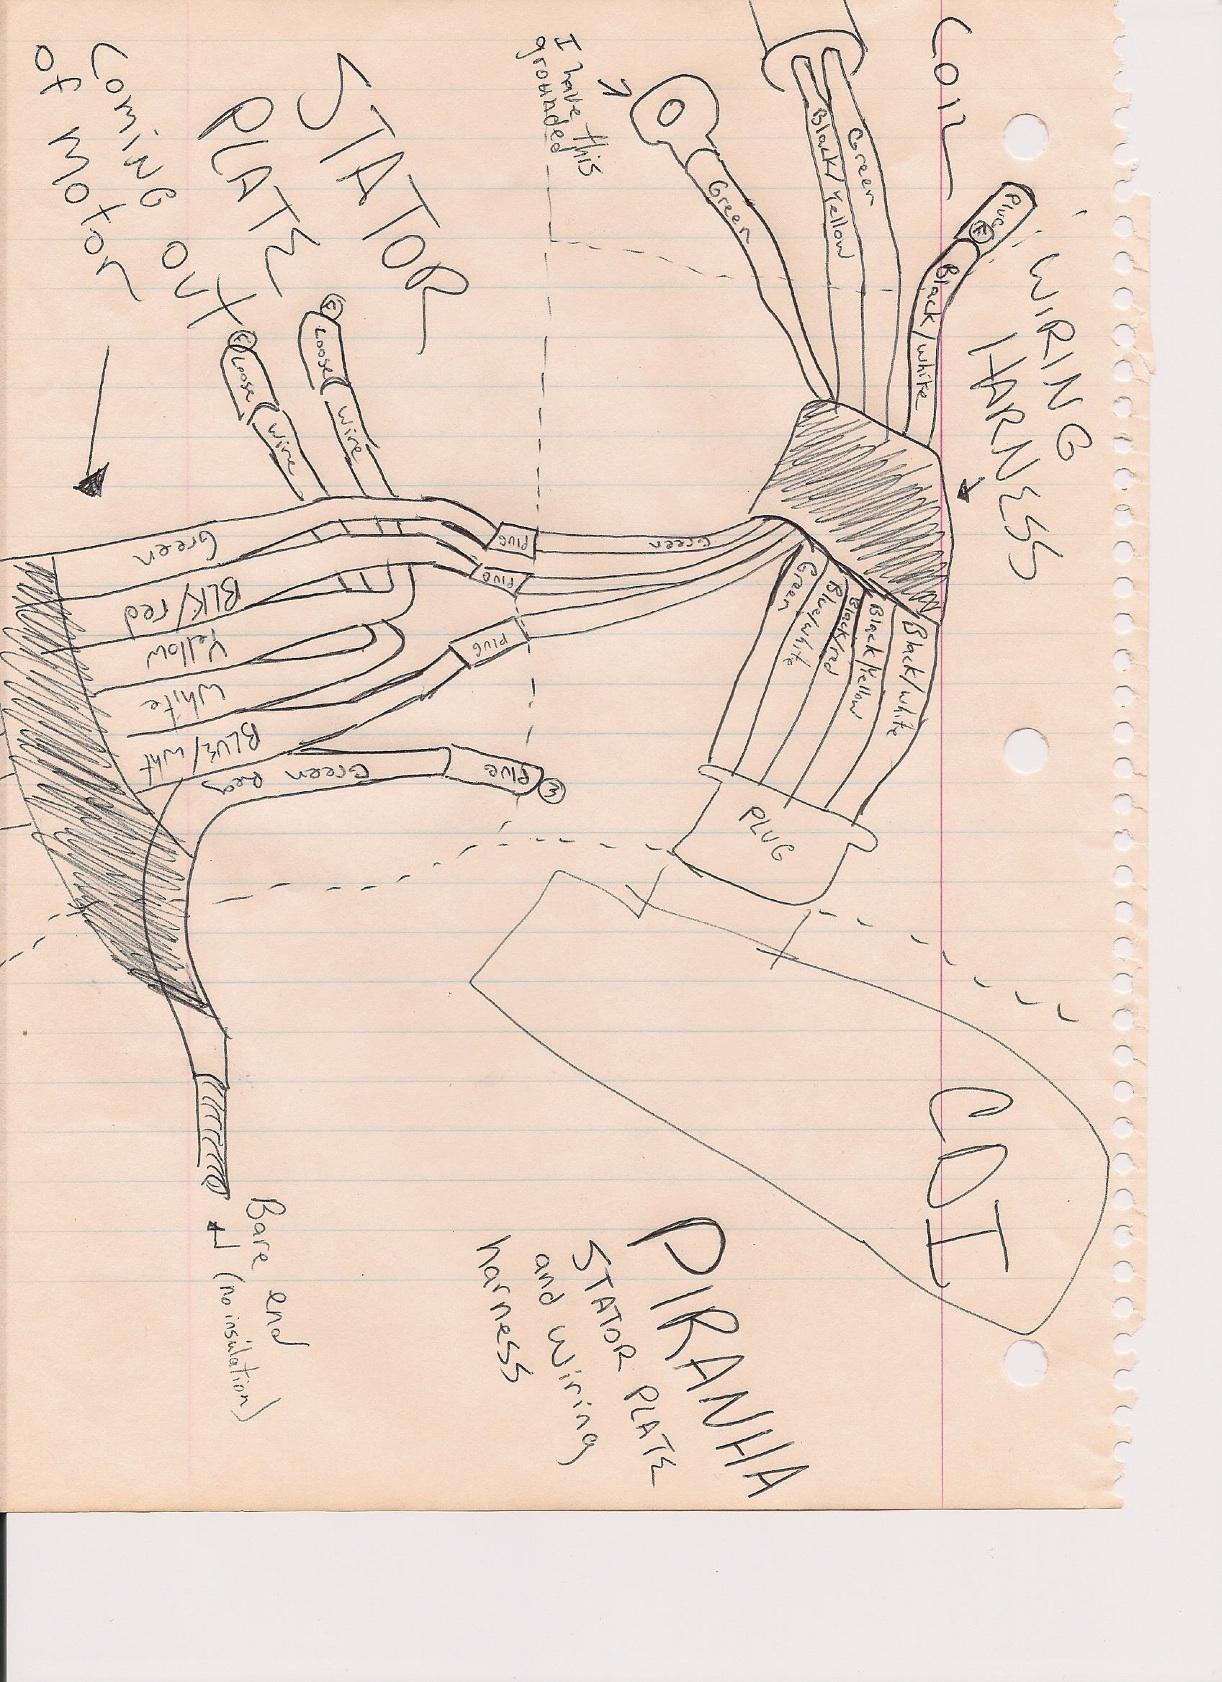 Help Please Wiring Diagram Thread Helpplease Name Drawn Wire Diagram2 Views 348